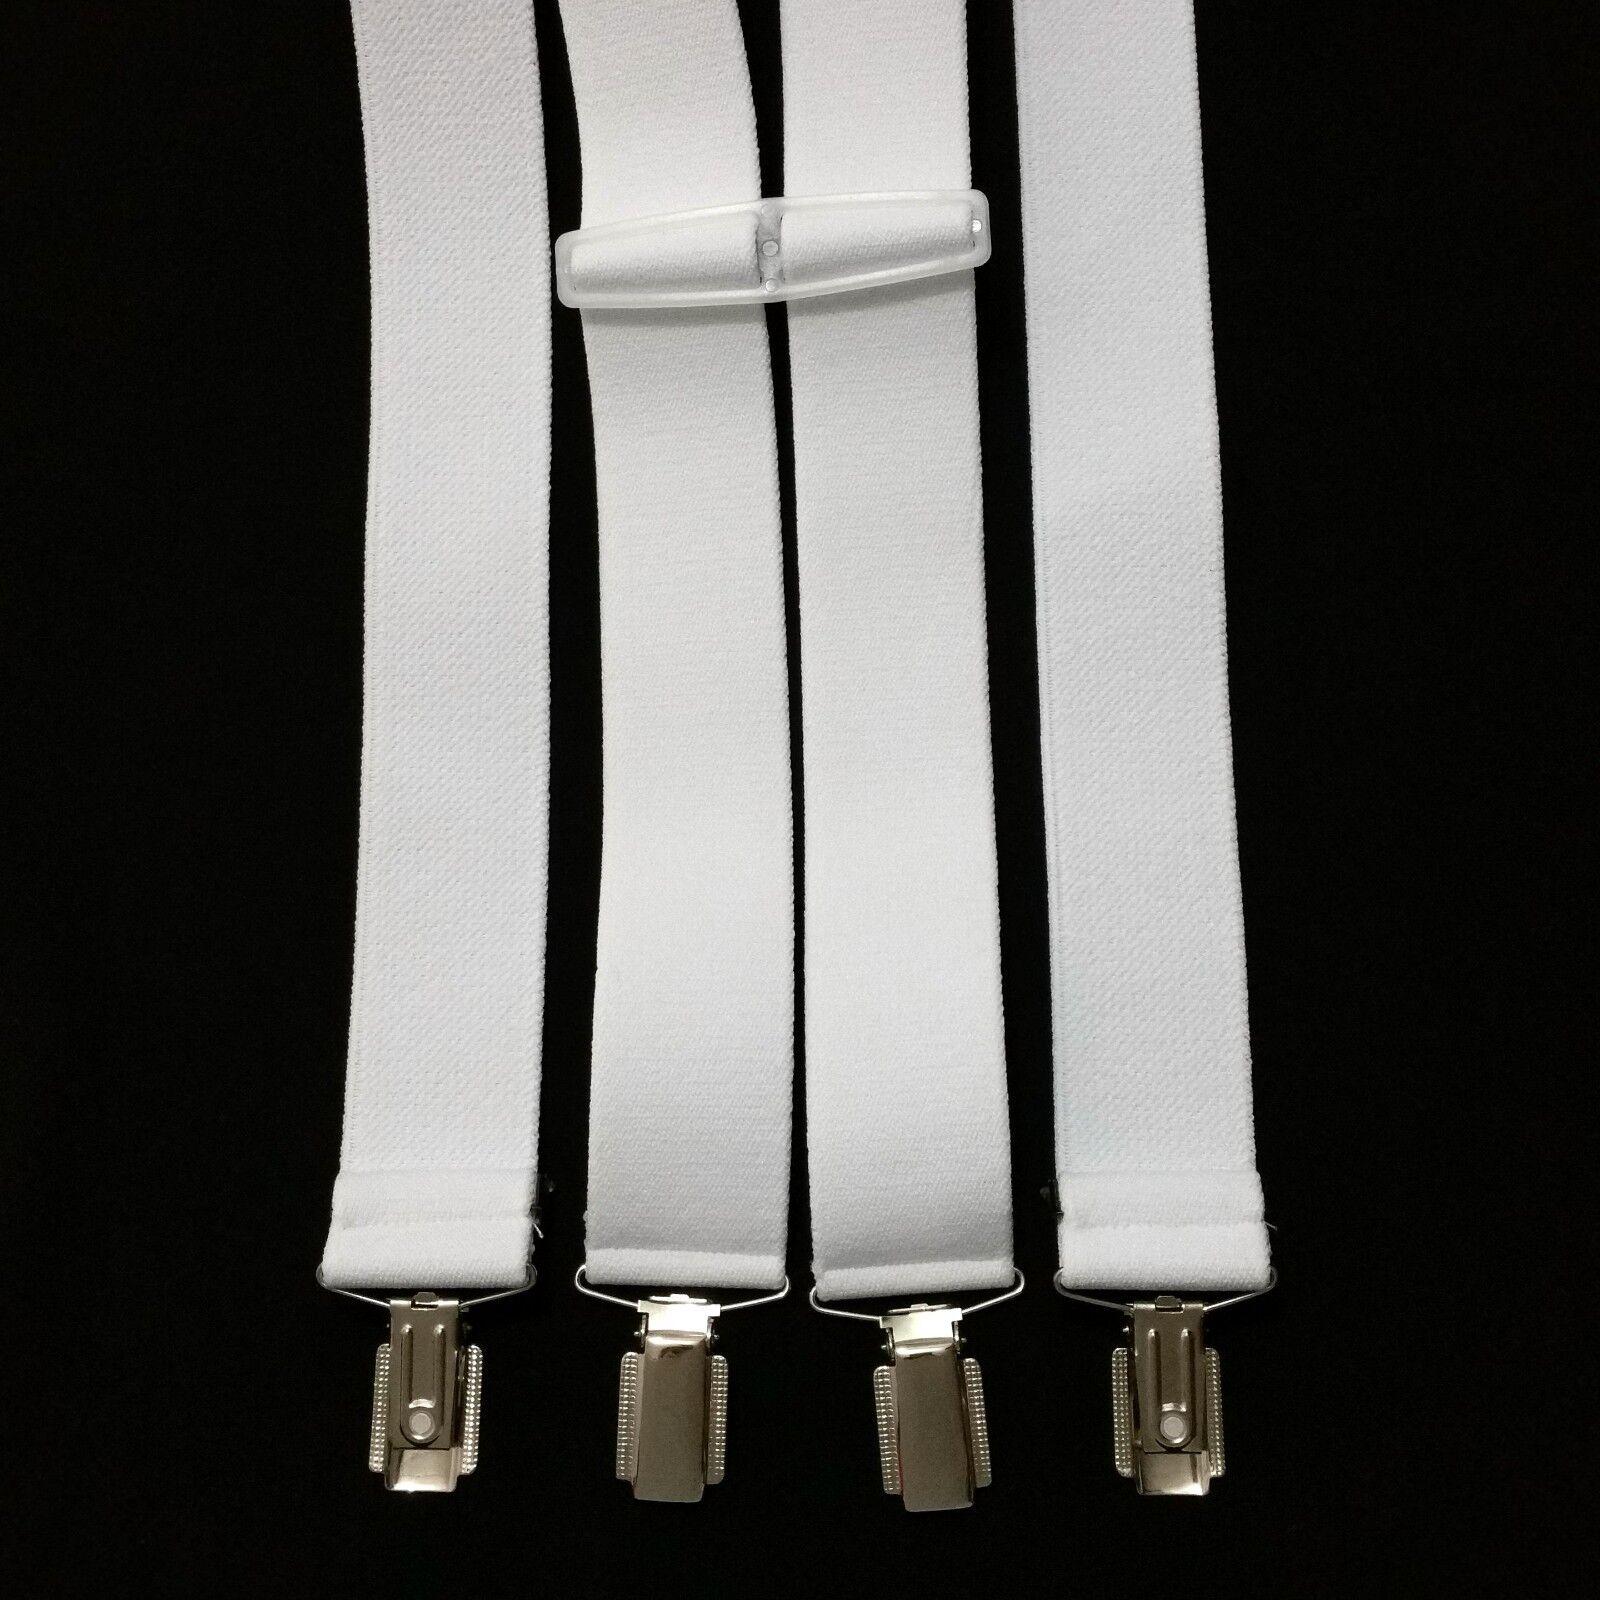 Damen Herren Hosenträger Hose Gürtel Weiß 4 starke Clips Träger H-Form breit